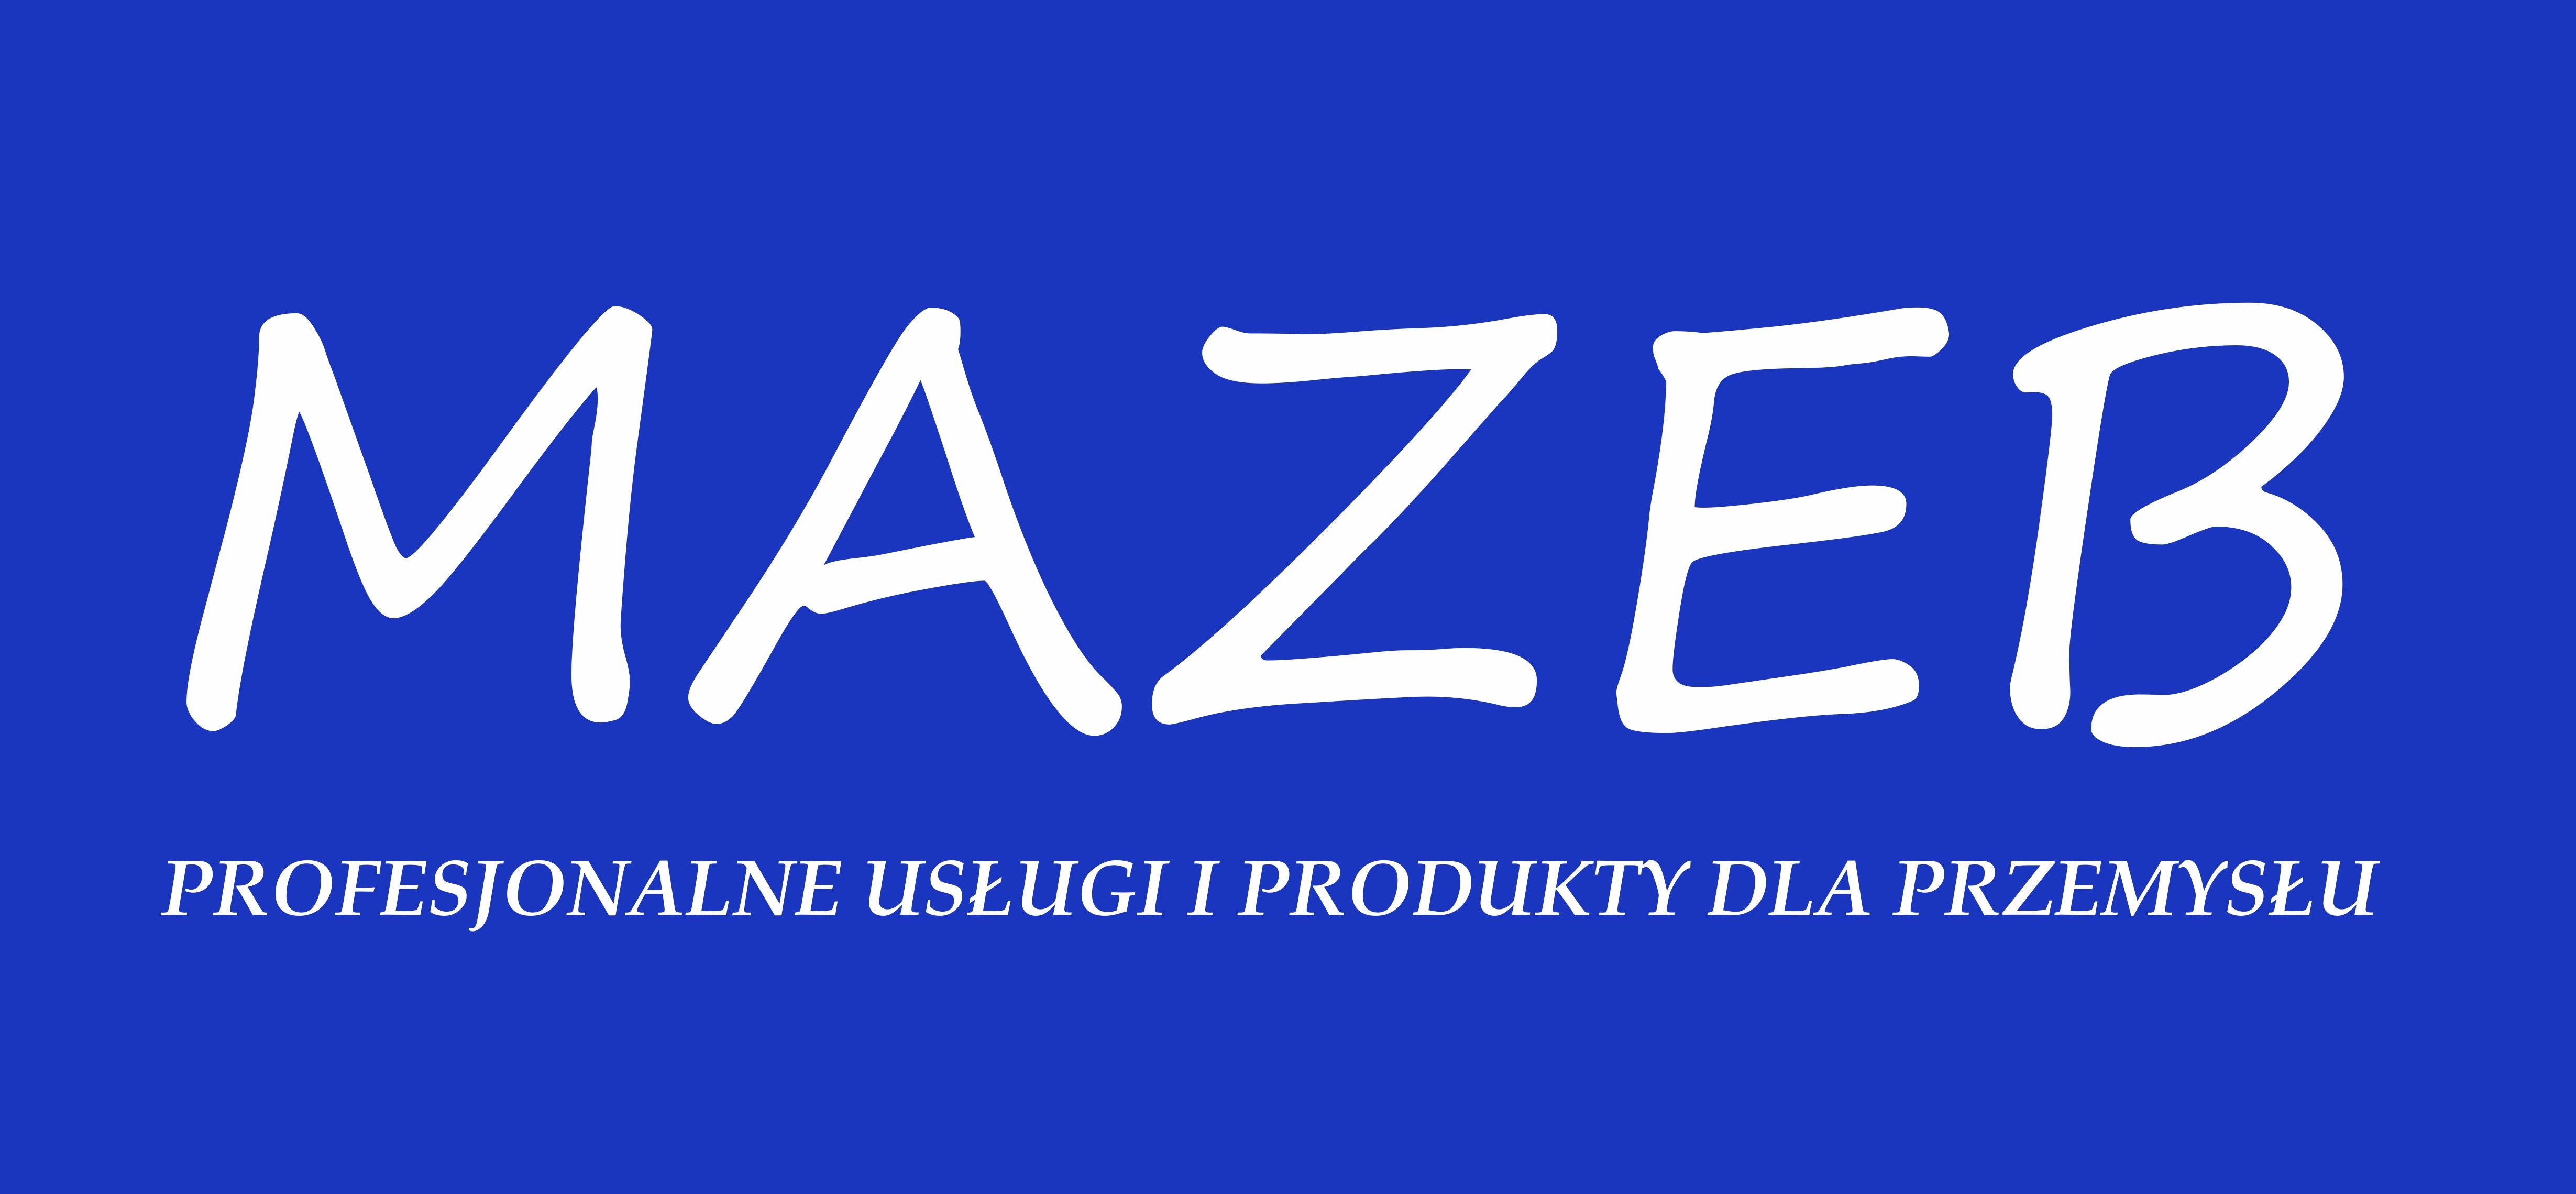 MAZEB